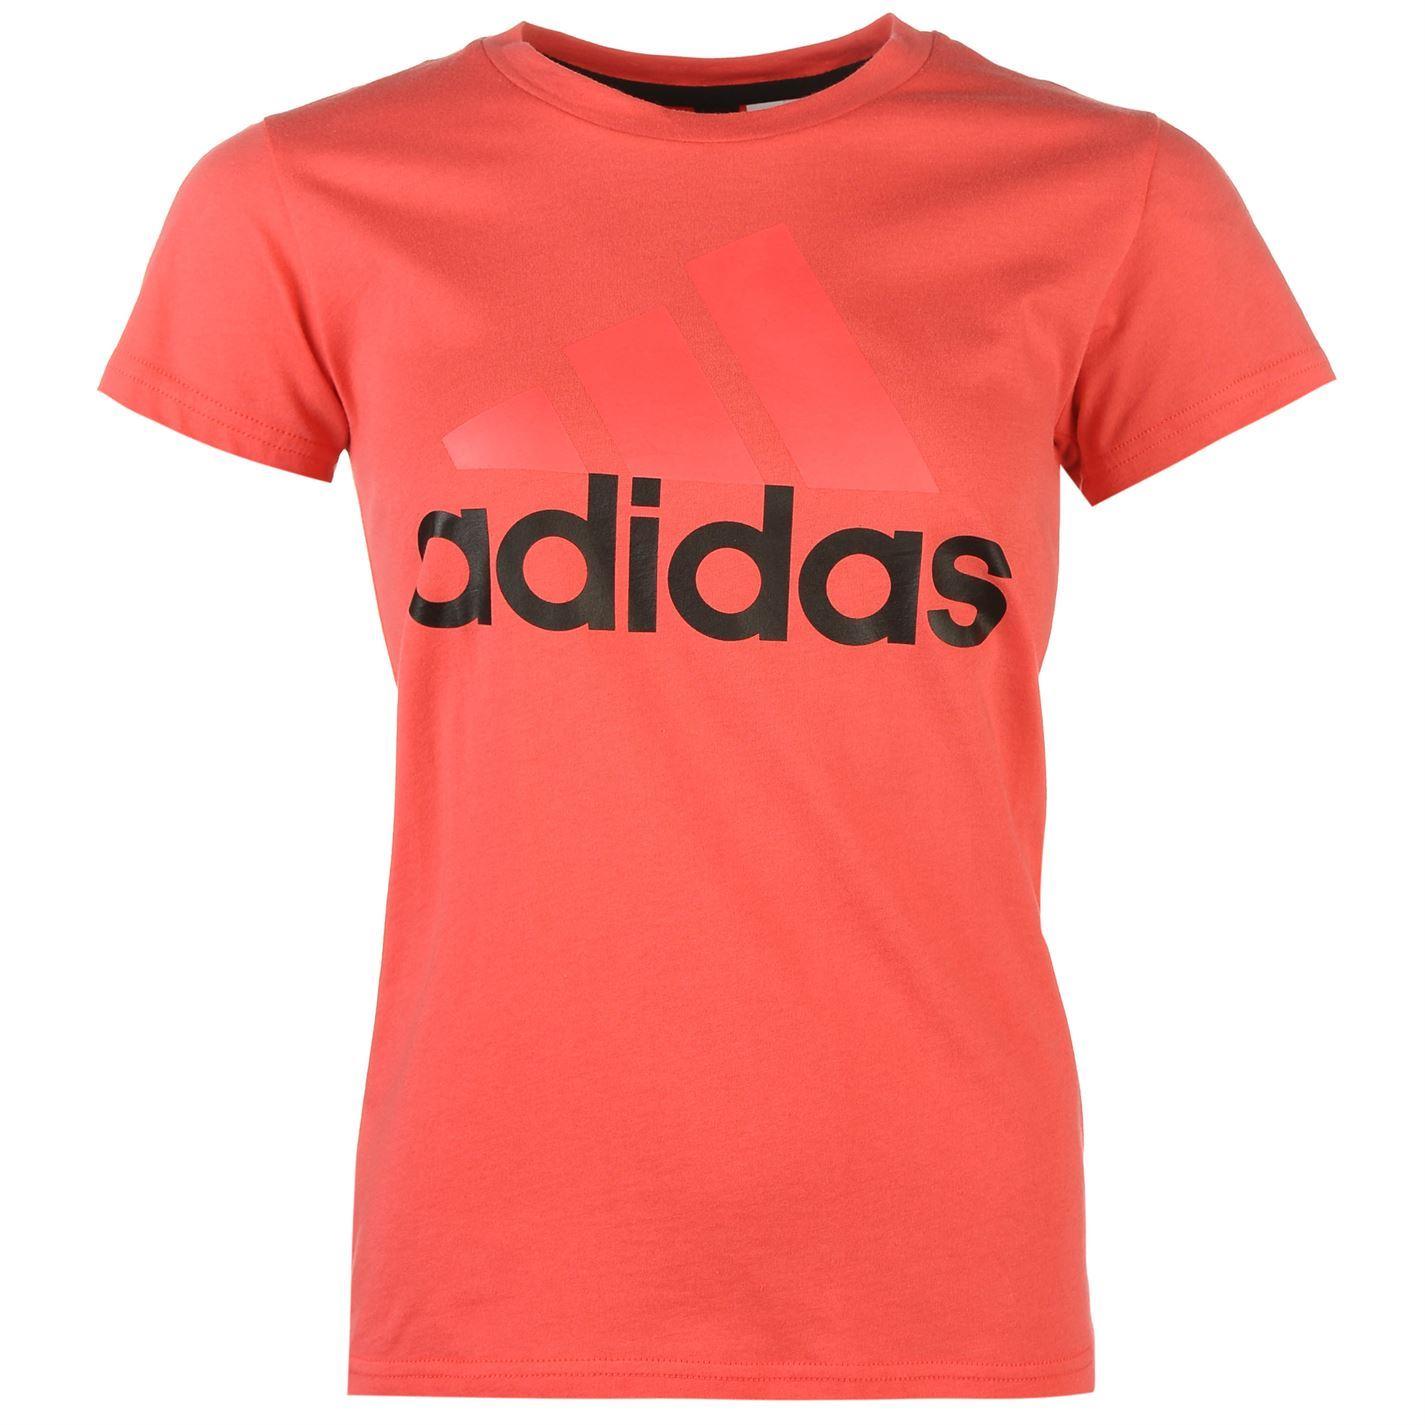 8a4620342451 adidas Ladies Linear QT T Shirt Top Tee Short Sleeve Clothing | eBay